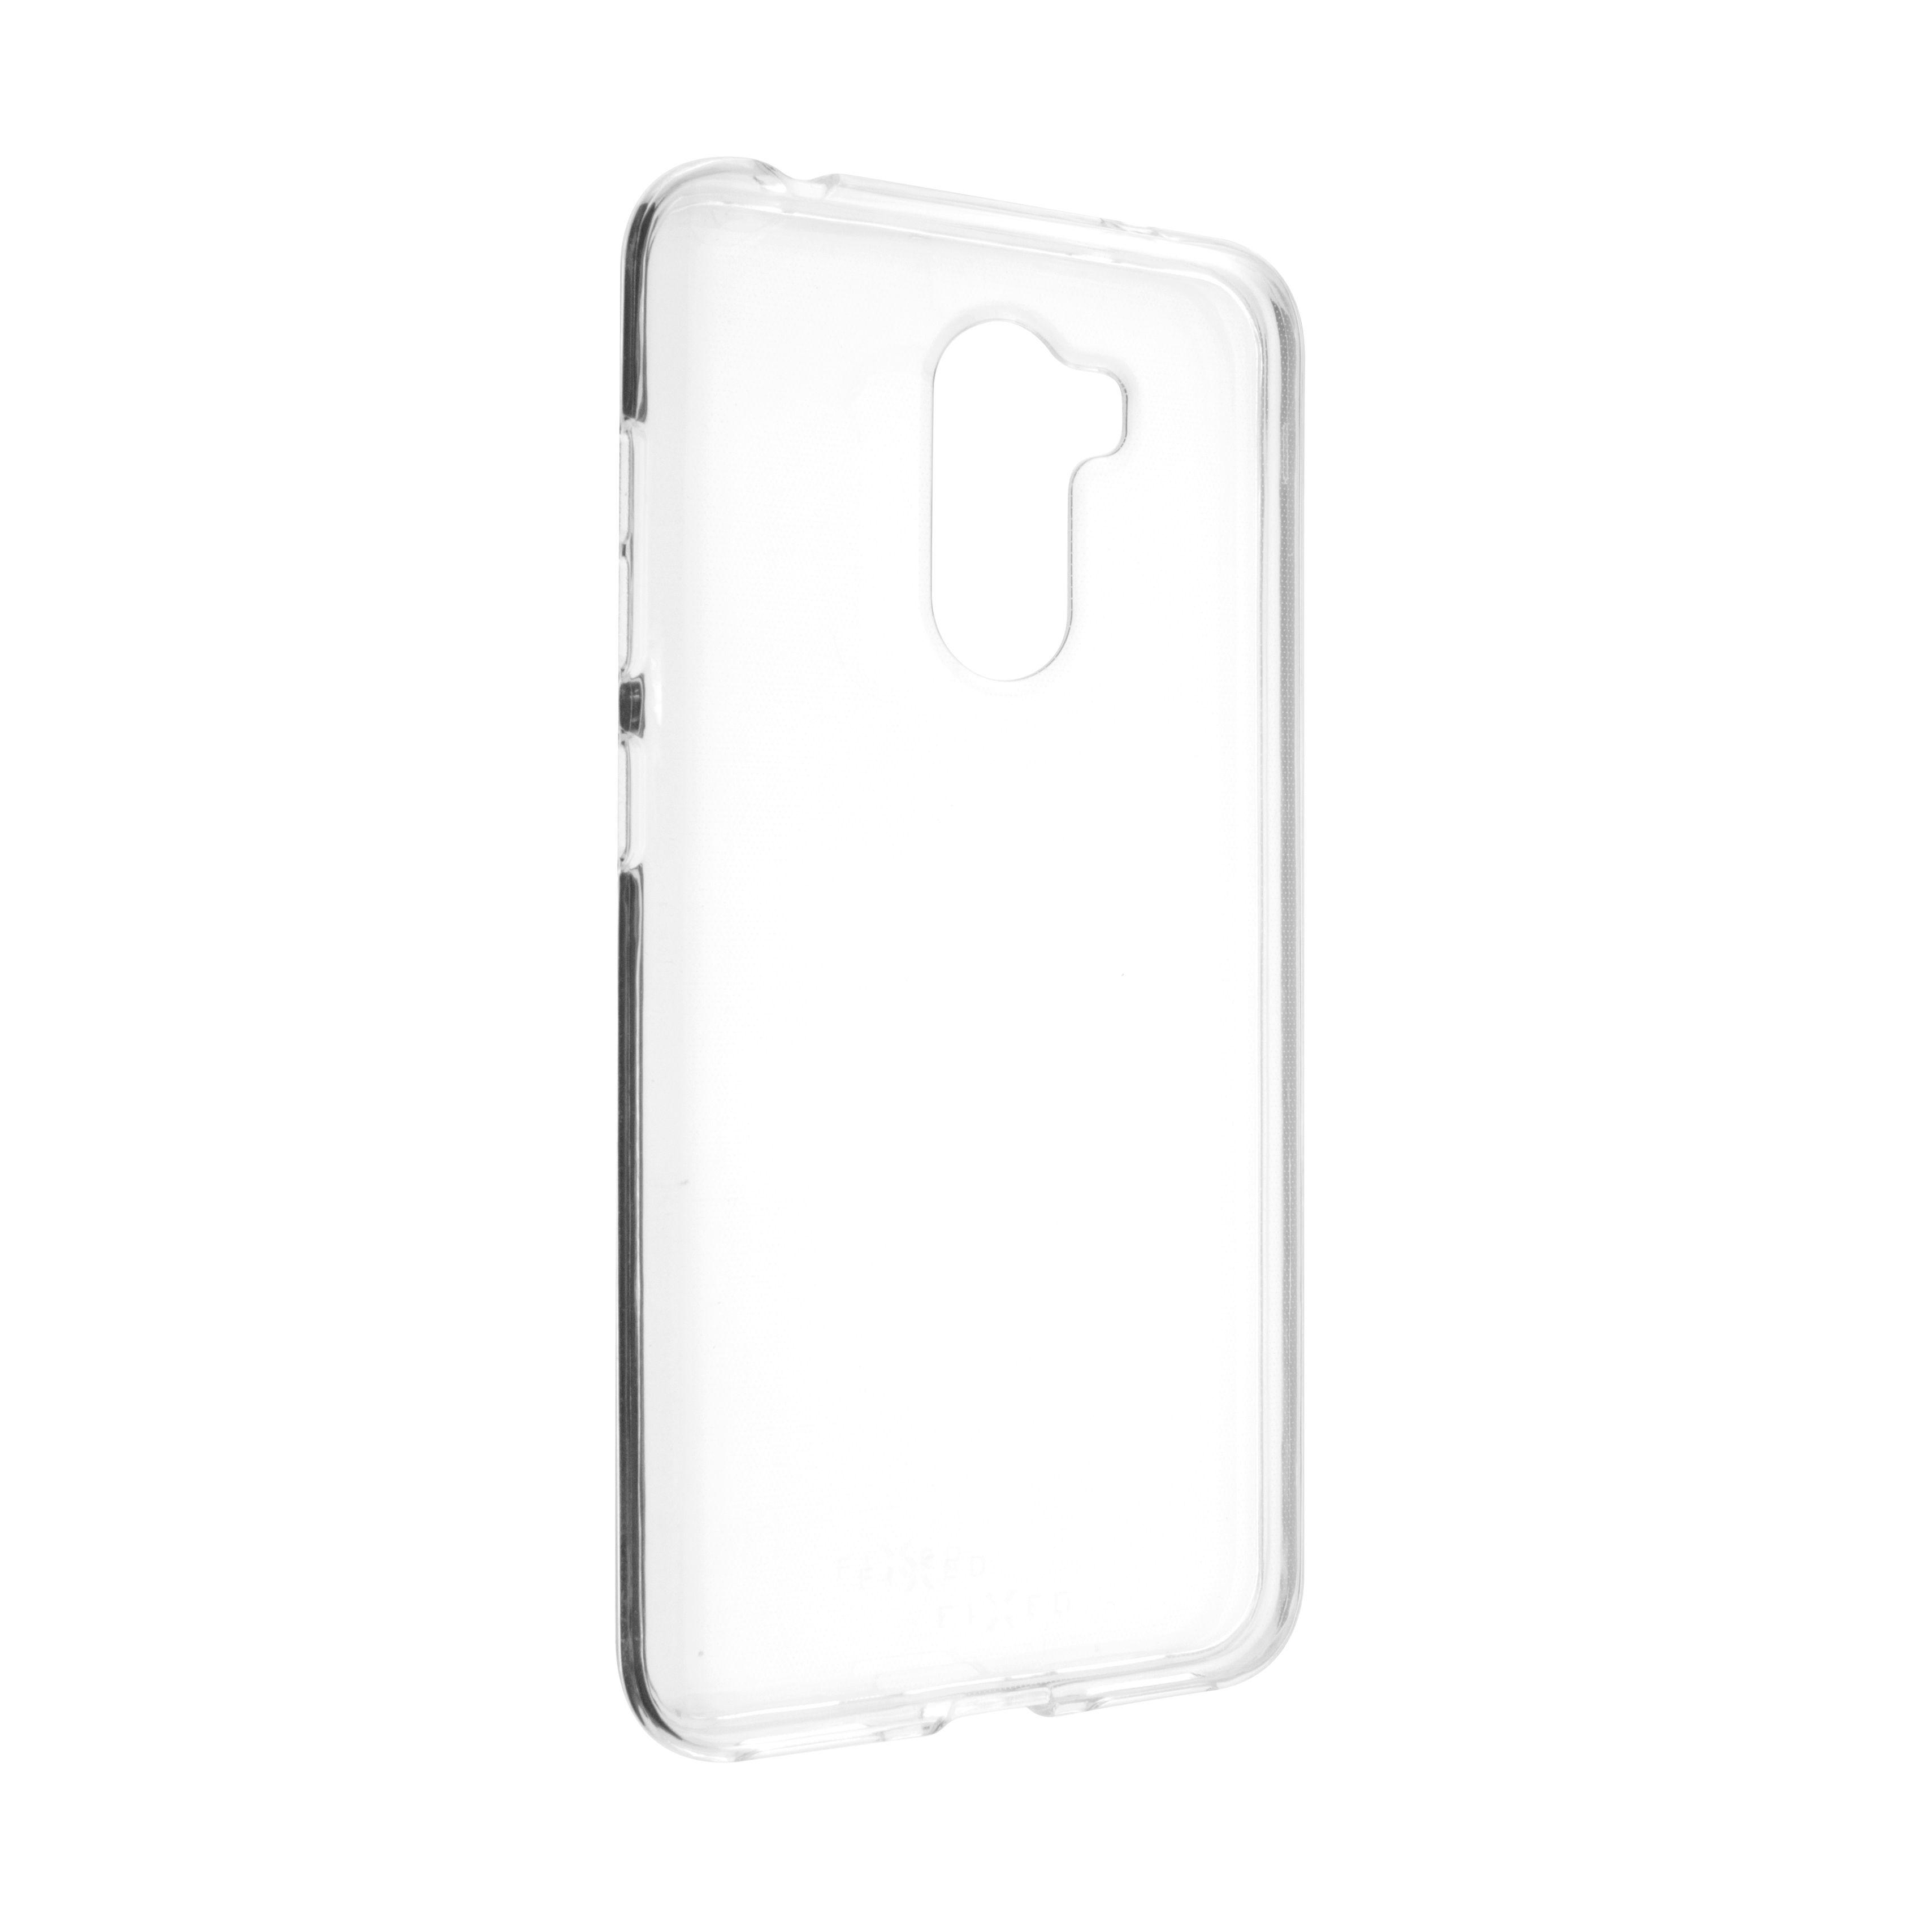 TPU gelové pouzdro FIXED pro Xiaomi Pocophone F1, čiré